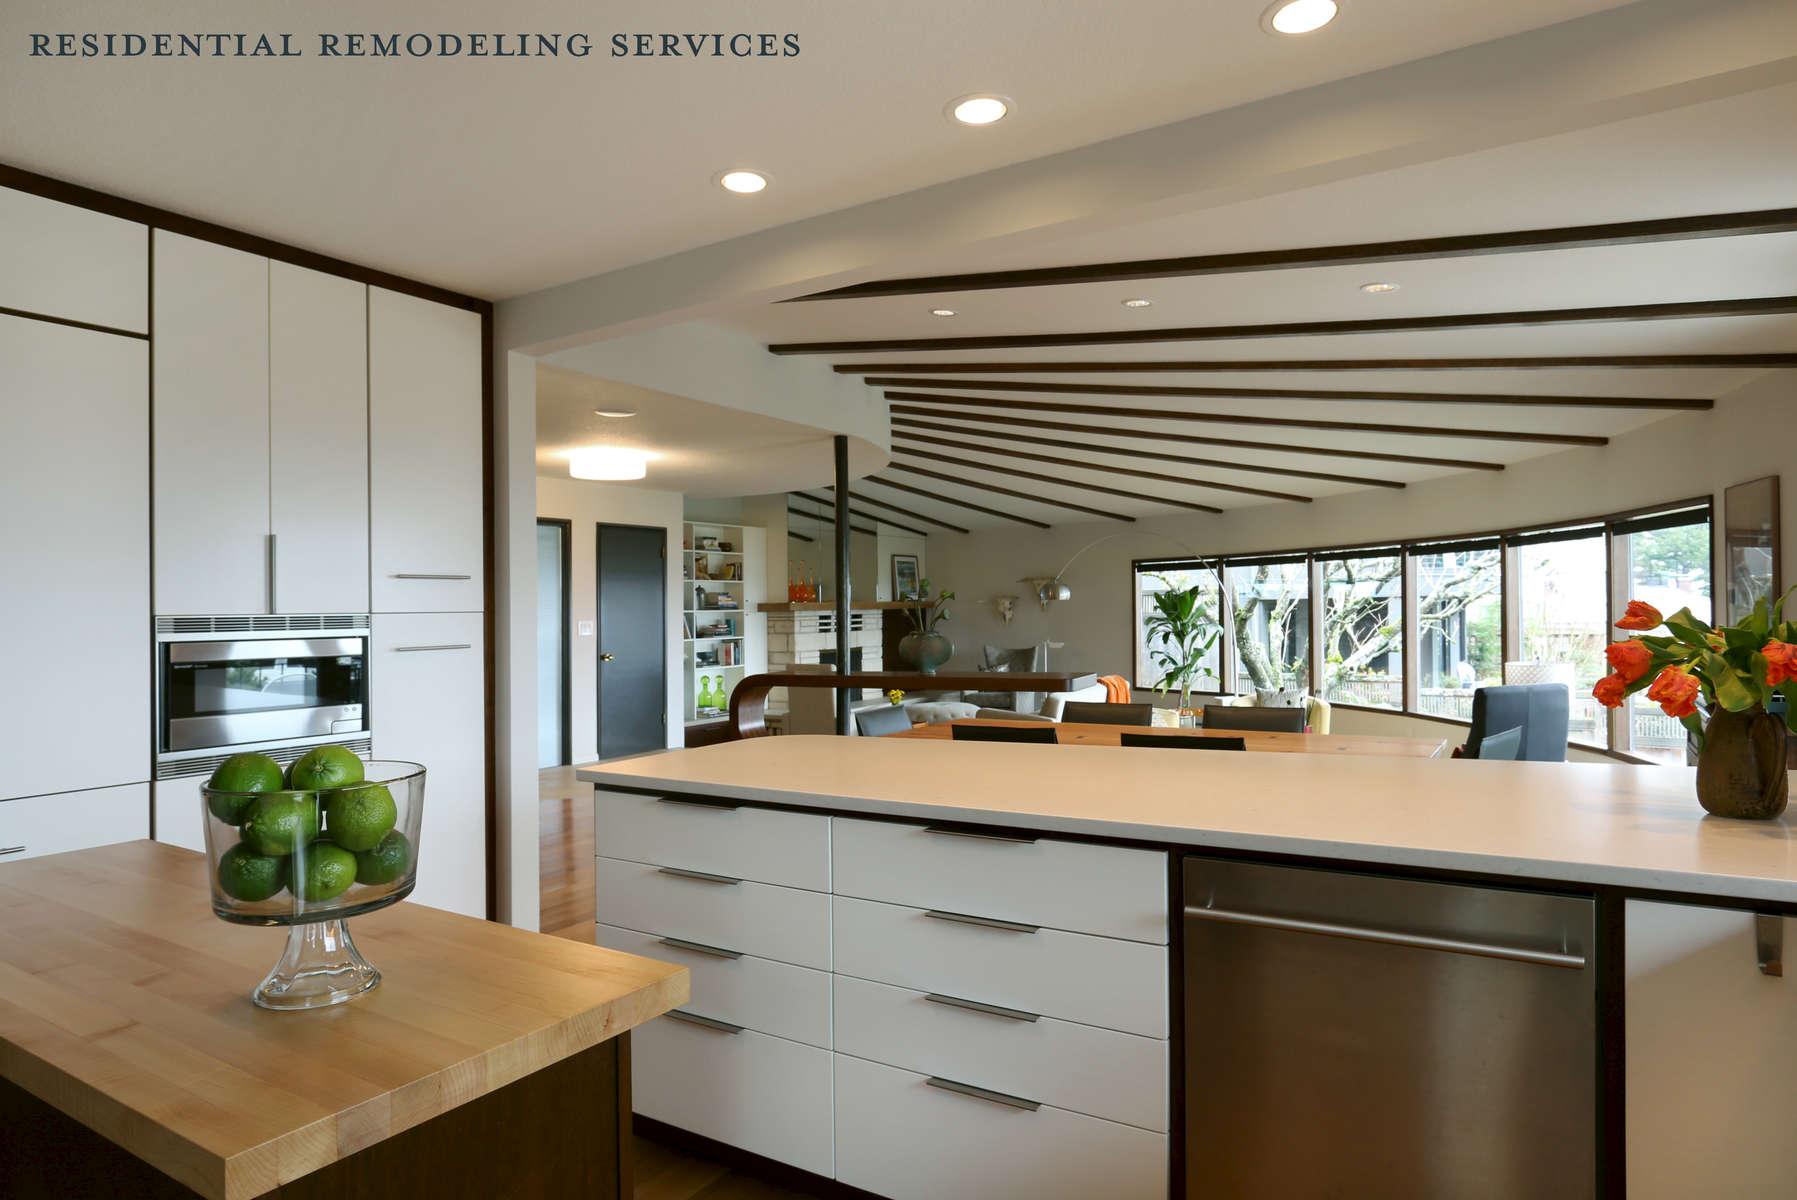 residentialremodelingservices2 Home Arciform Portland